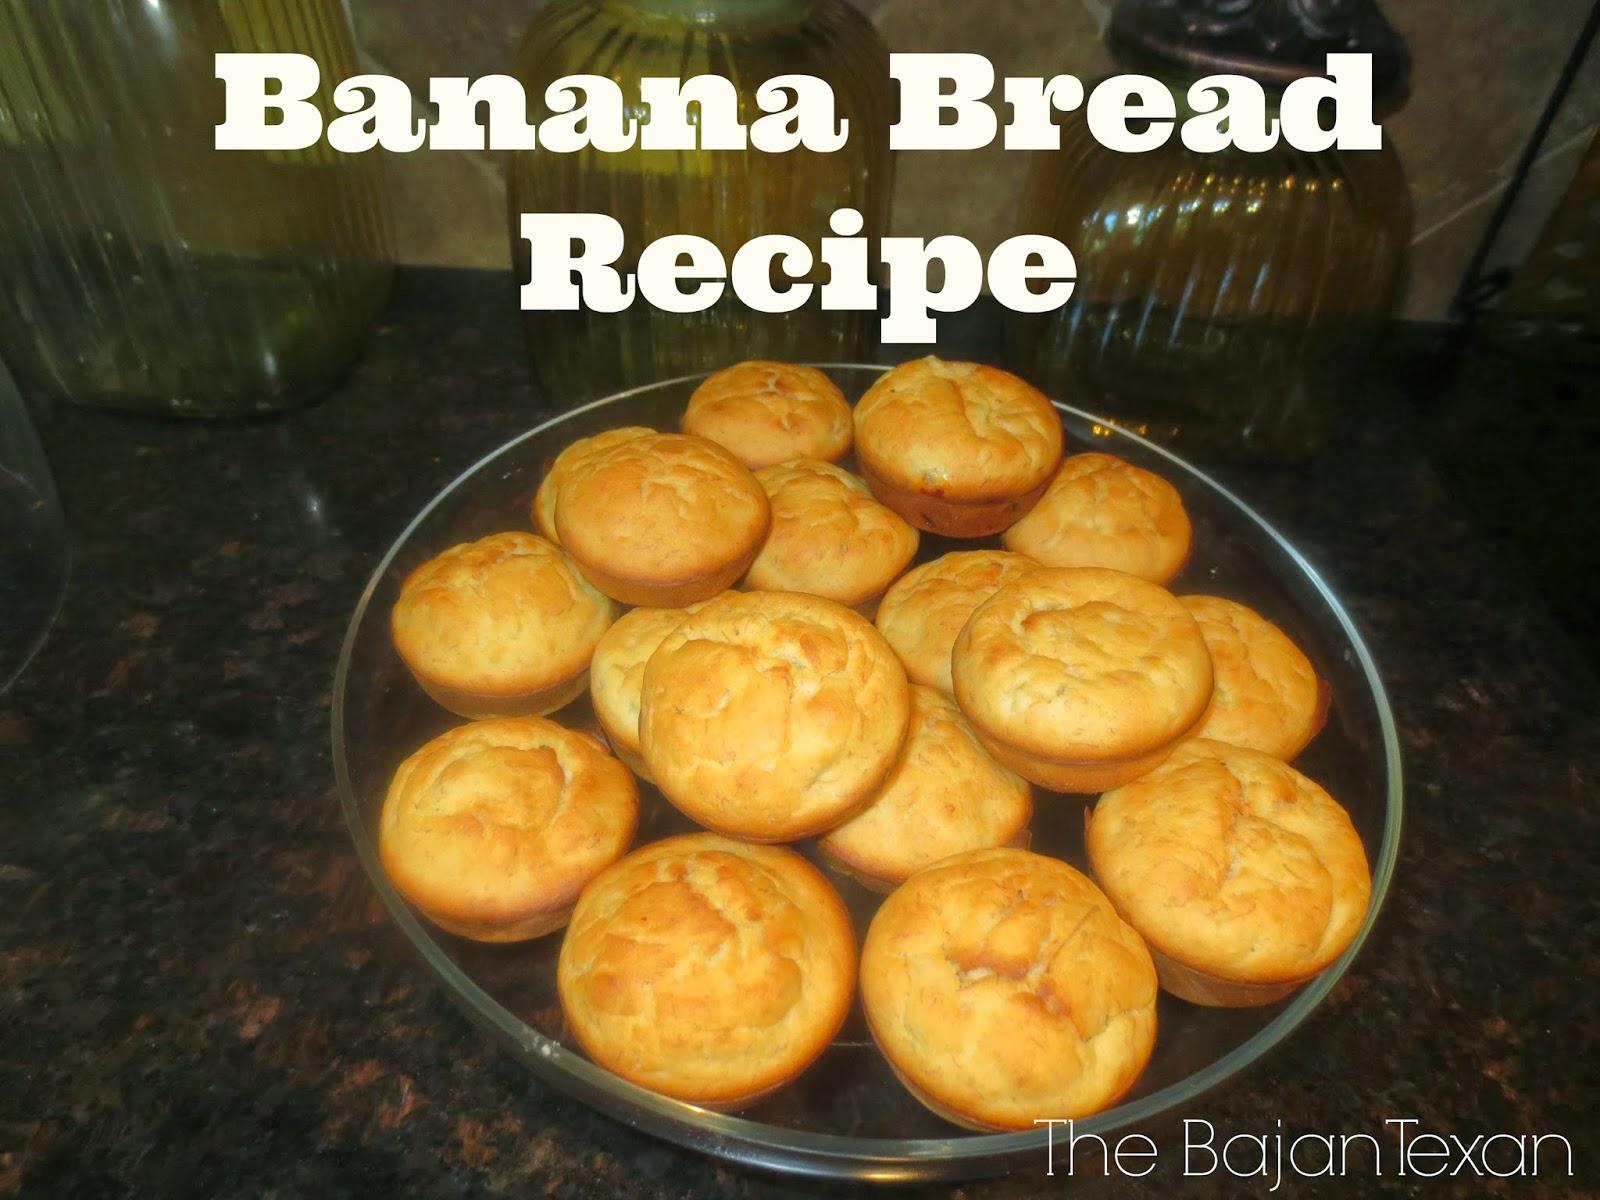 Moist banana bread recipe the bajan texan moist banana bread recipe bake some moist and yummy banana bread for the whole family forumfinder Choice Image